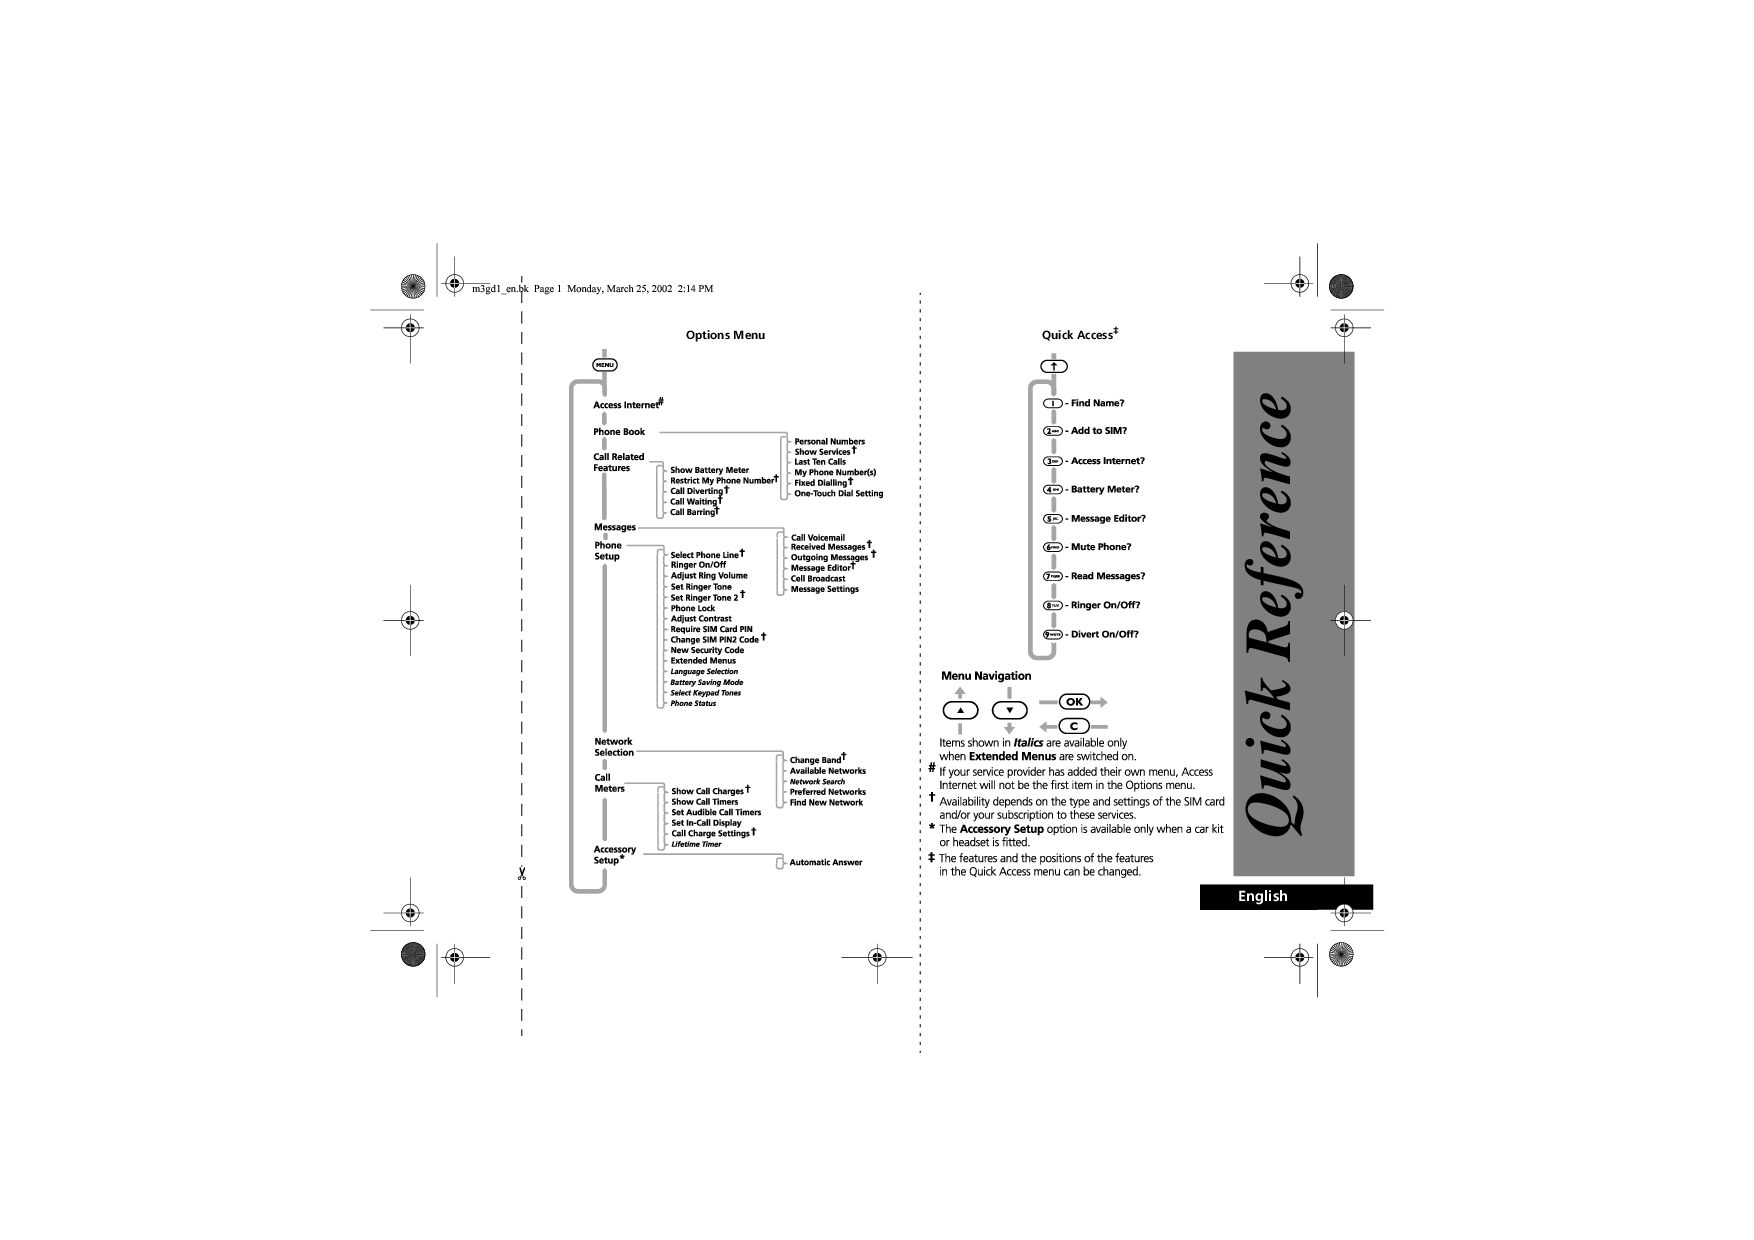 Motorola surfboard sb5100 users manual mcsa7228 sheet.